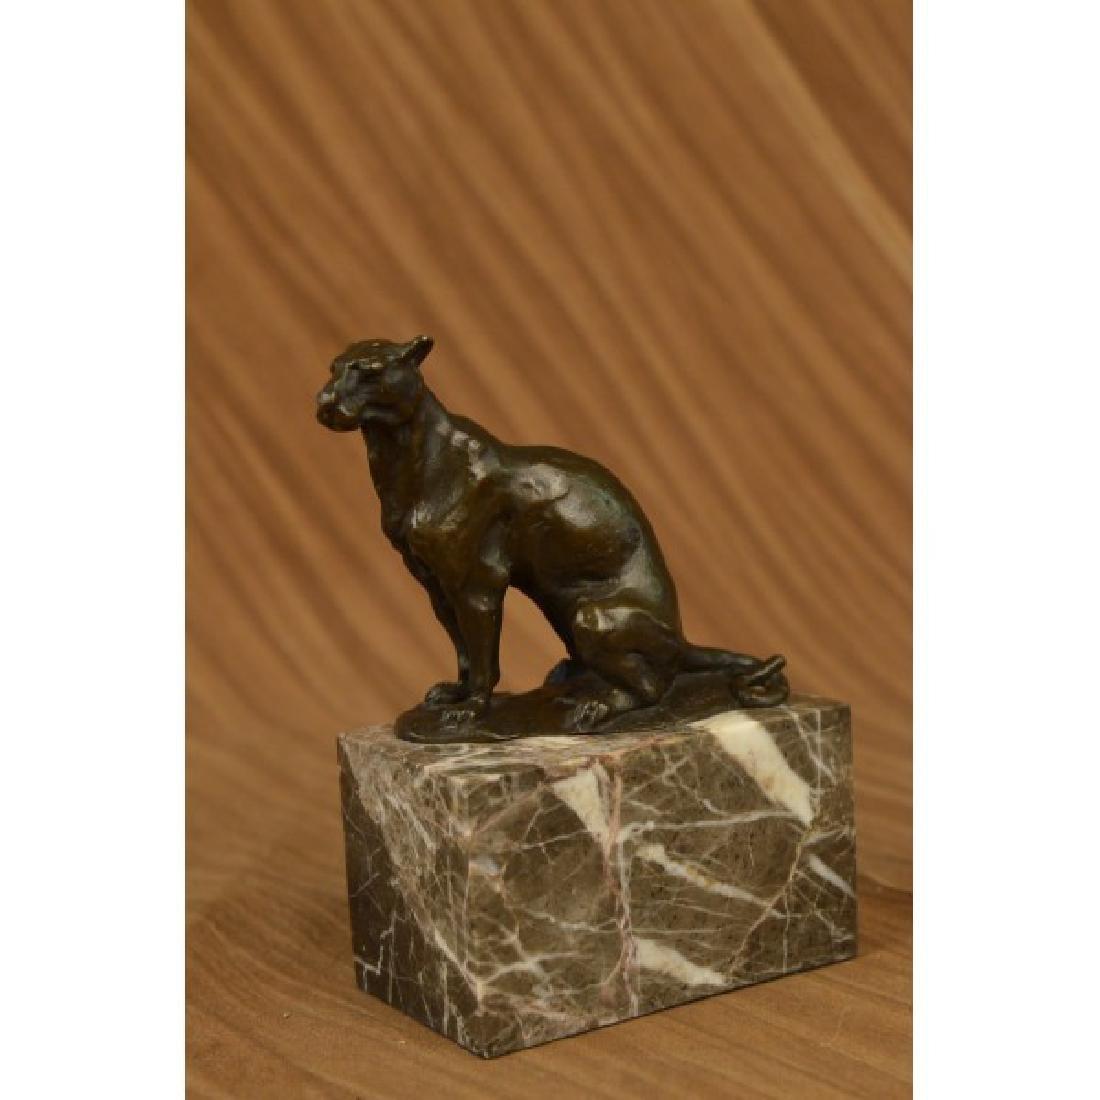 Bugatti Book End Bookend Cougar Mountain Lion Bronze